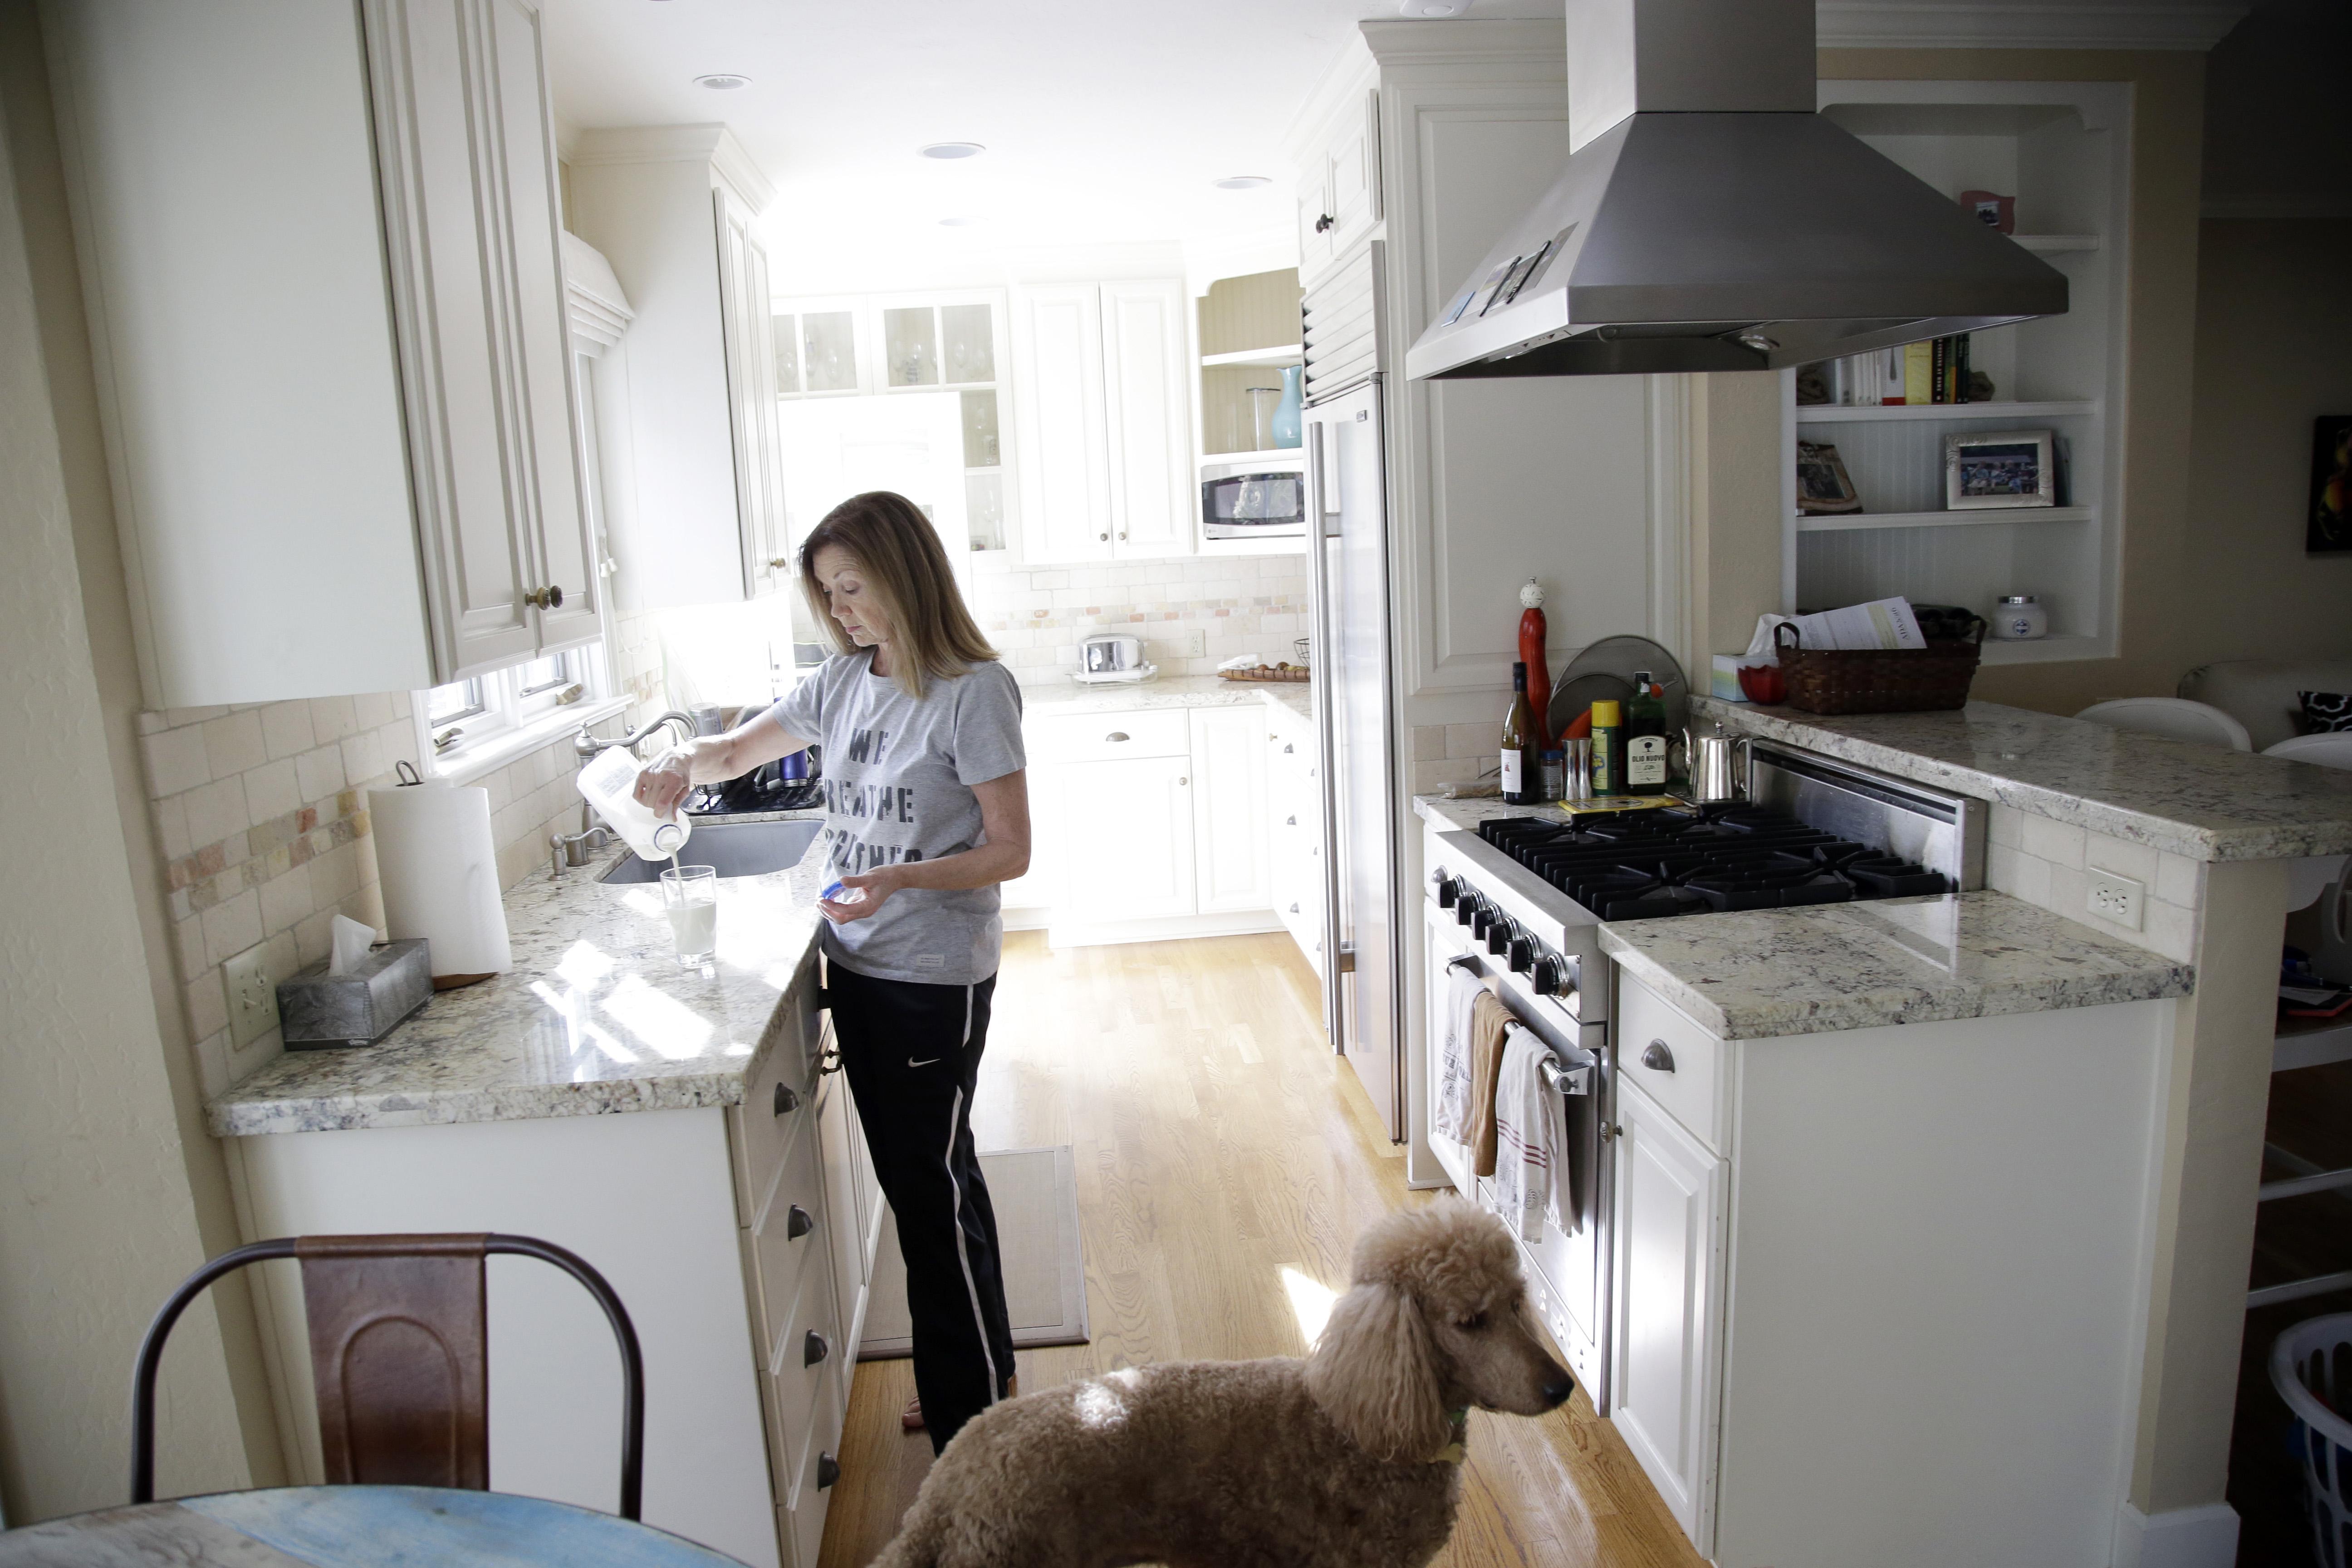 San Francisco - Super Bowl 50: Residents List Rentals At Super-sized ...